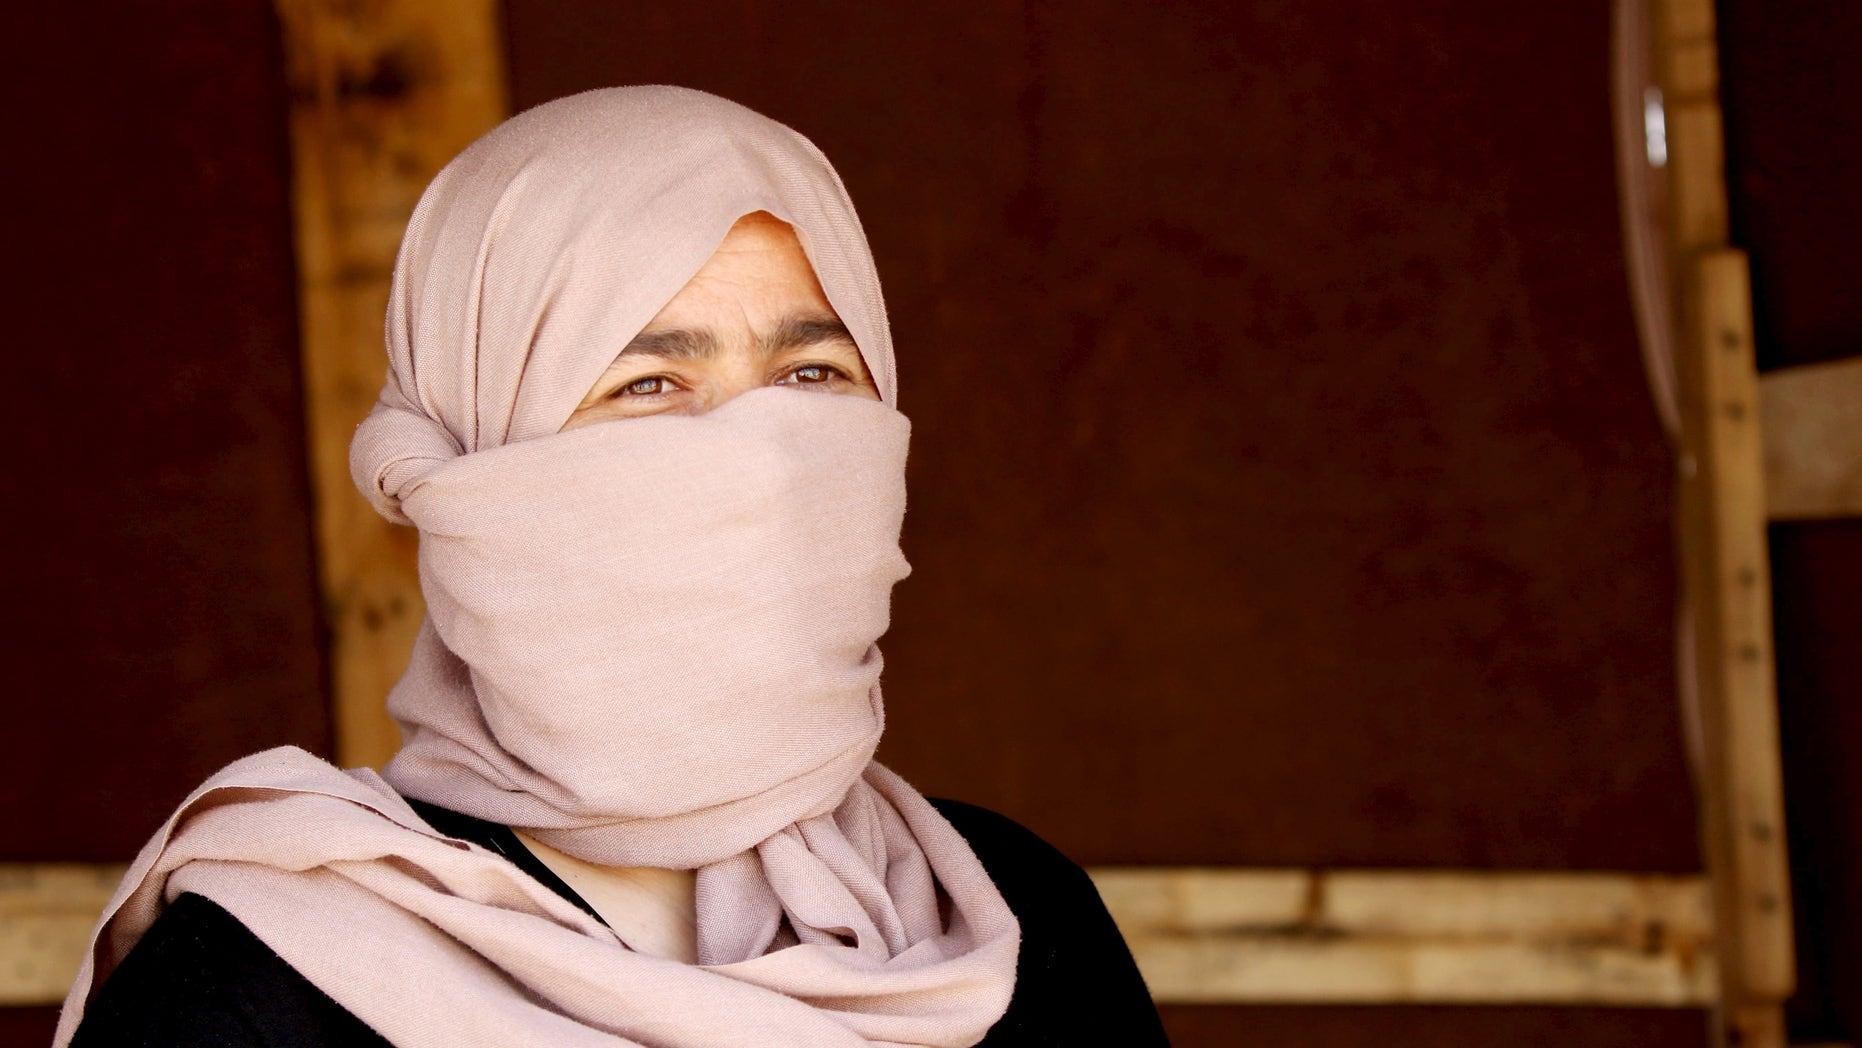 July 4, 2015: A Yazidi woman who escaped ISIS captivity. (Reuters)